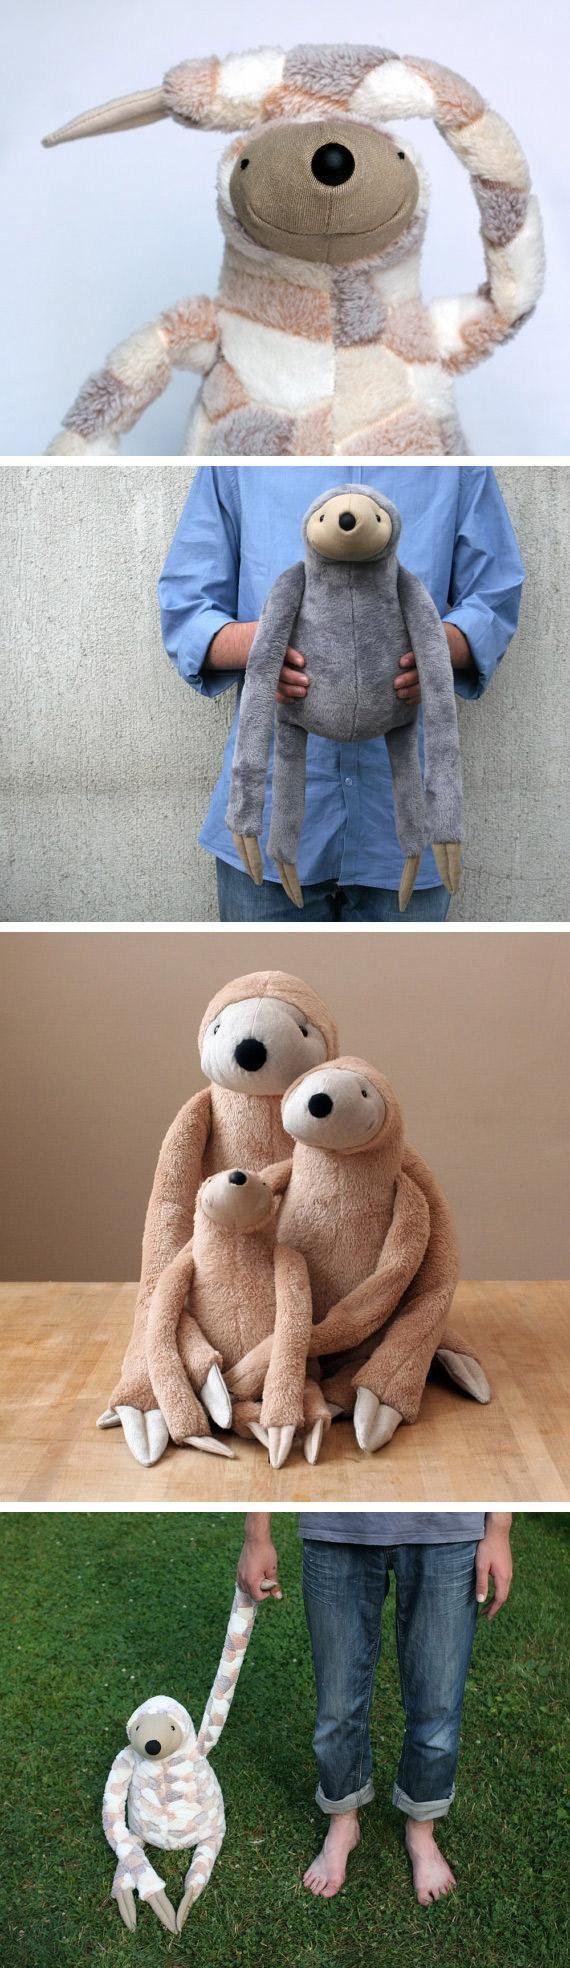 stuffed toys 7